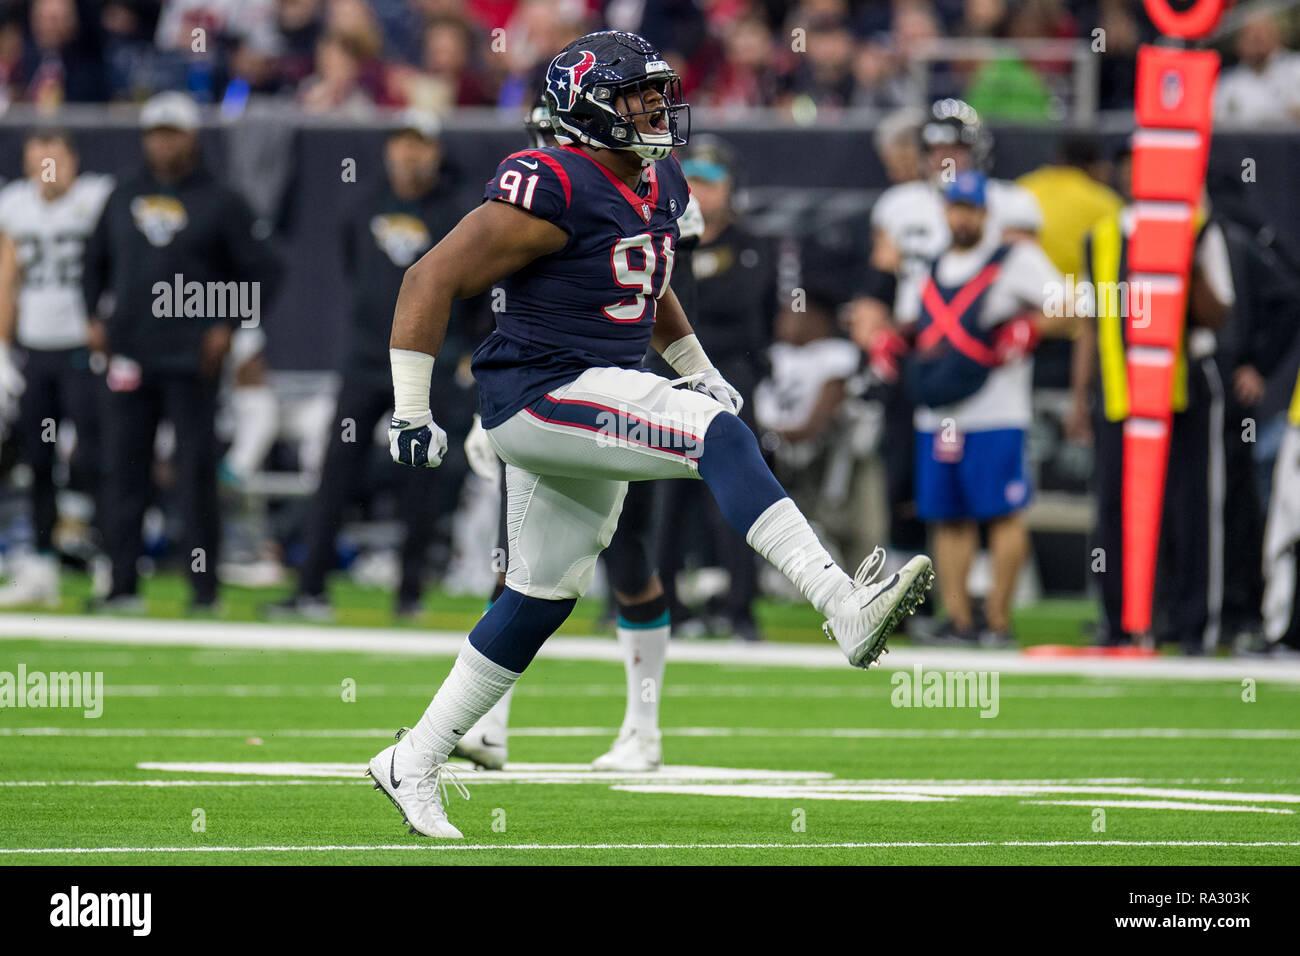 reputable site 980ef 59982 Houston, TX, USA. 30th Dec, 2018. Houston Texans defensive ...